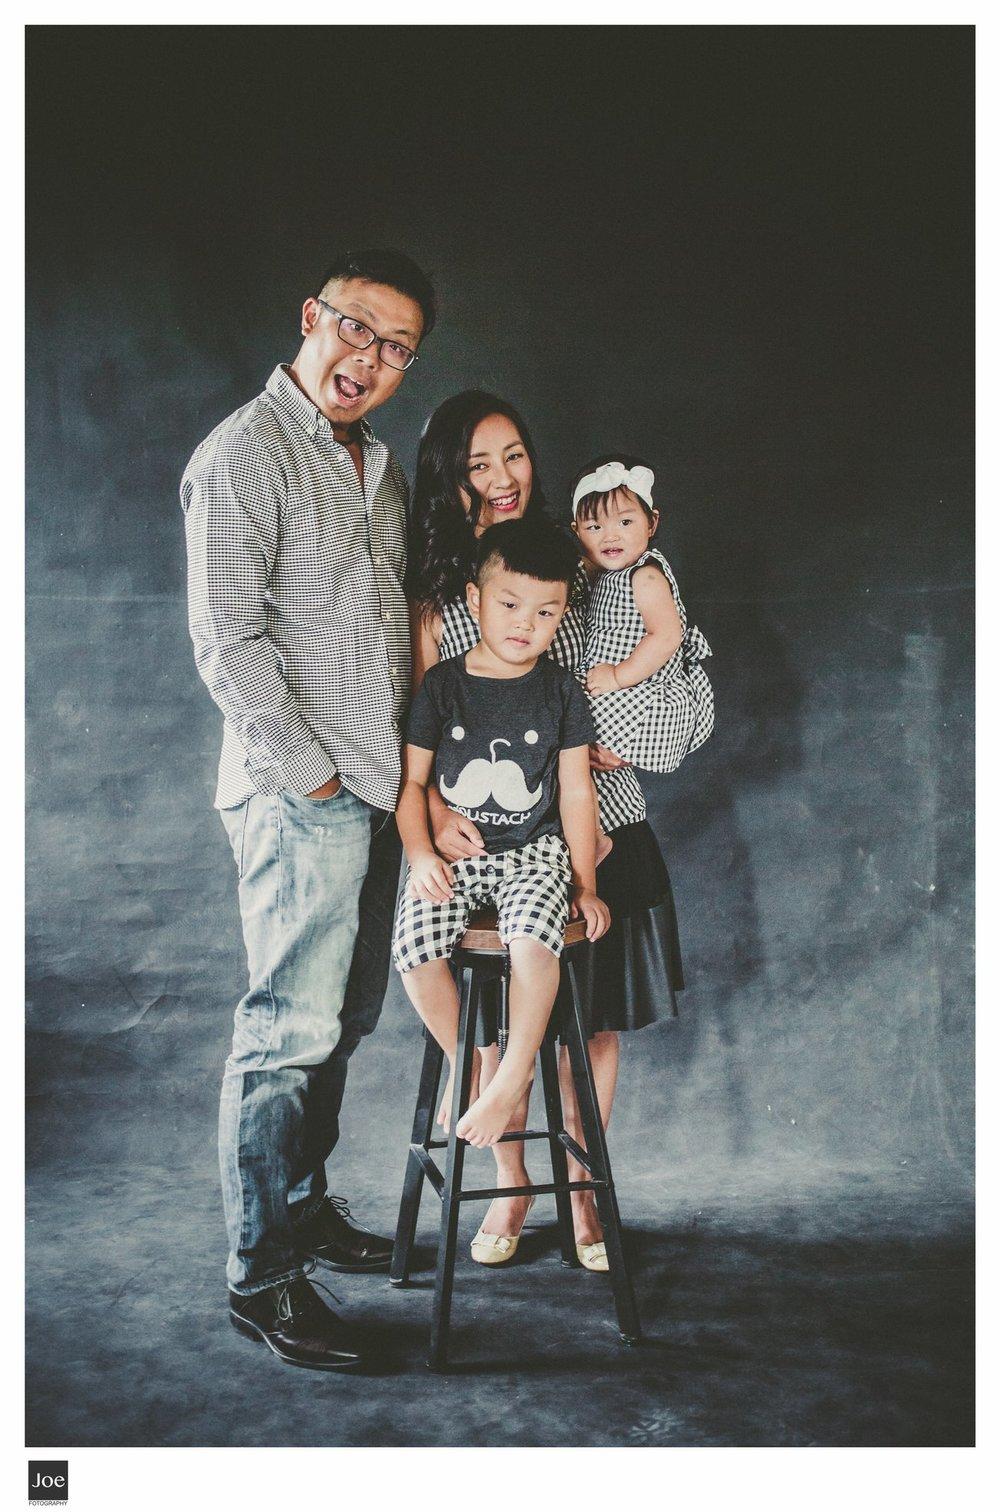 joe-fotography-family-photo-pepper-salt-bowtie-004.jpg